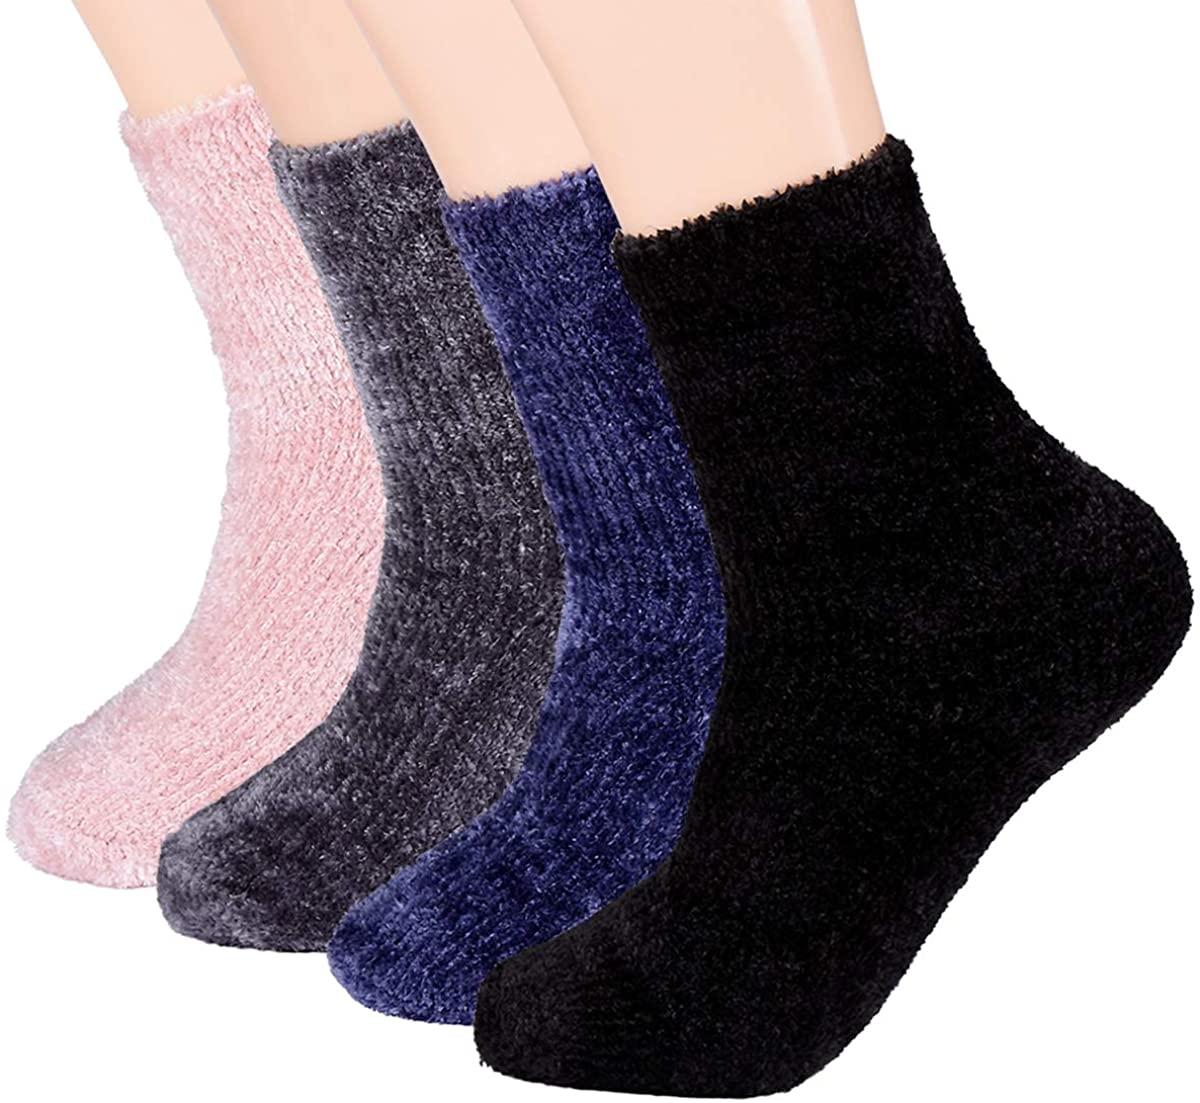 Womens Comfy&Soft Plush Chenille Sherpa Slipper Socks, Fluffy Crew Socks Casual Home Sleeping Sock, 3-5 Pairs